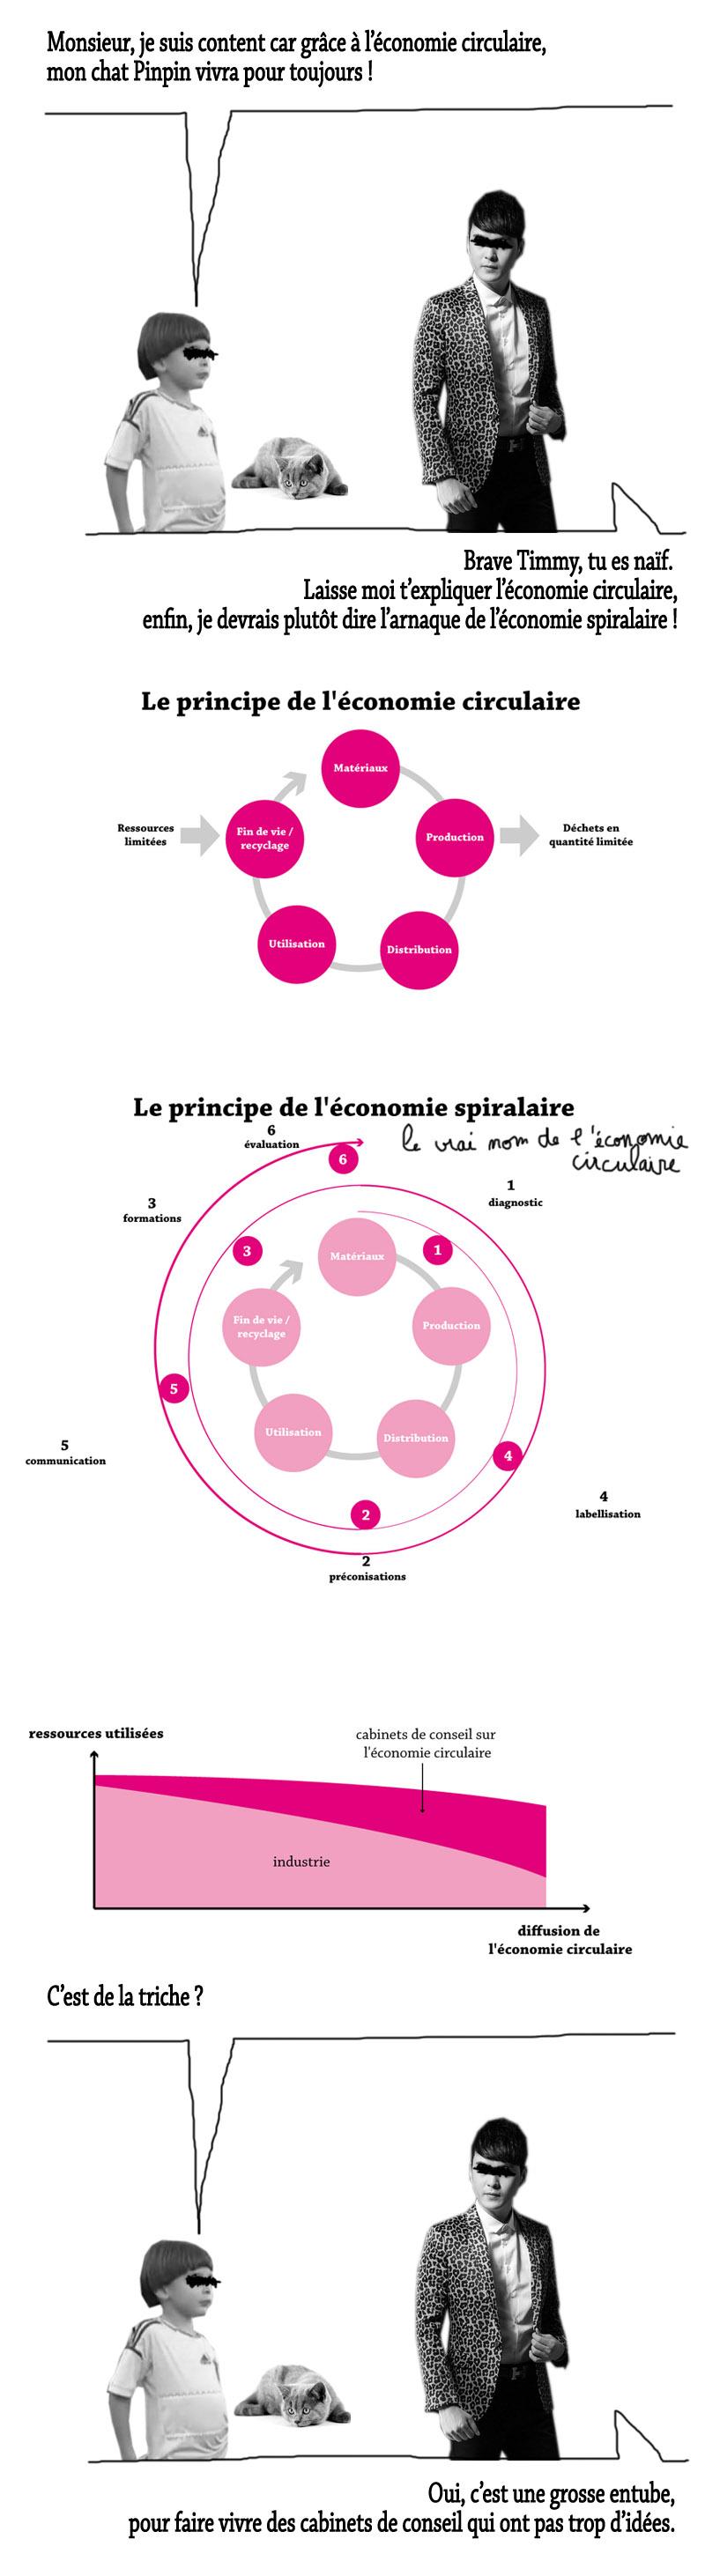 deuxdegres_economie_economie-circulaire_critique